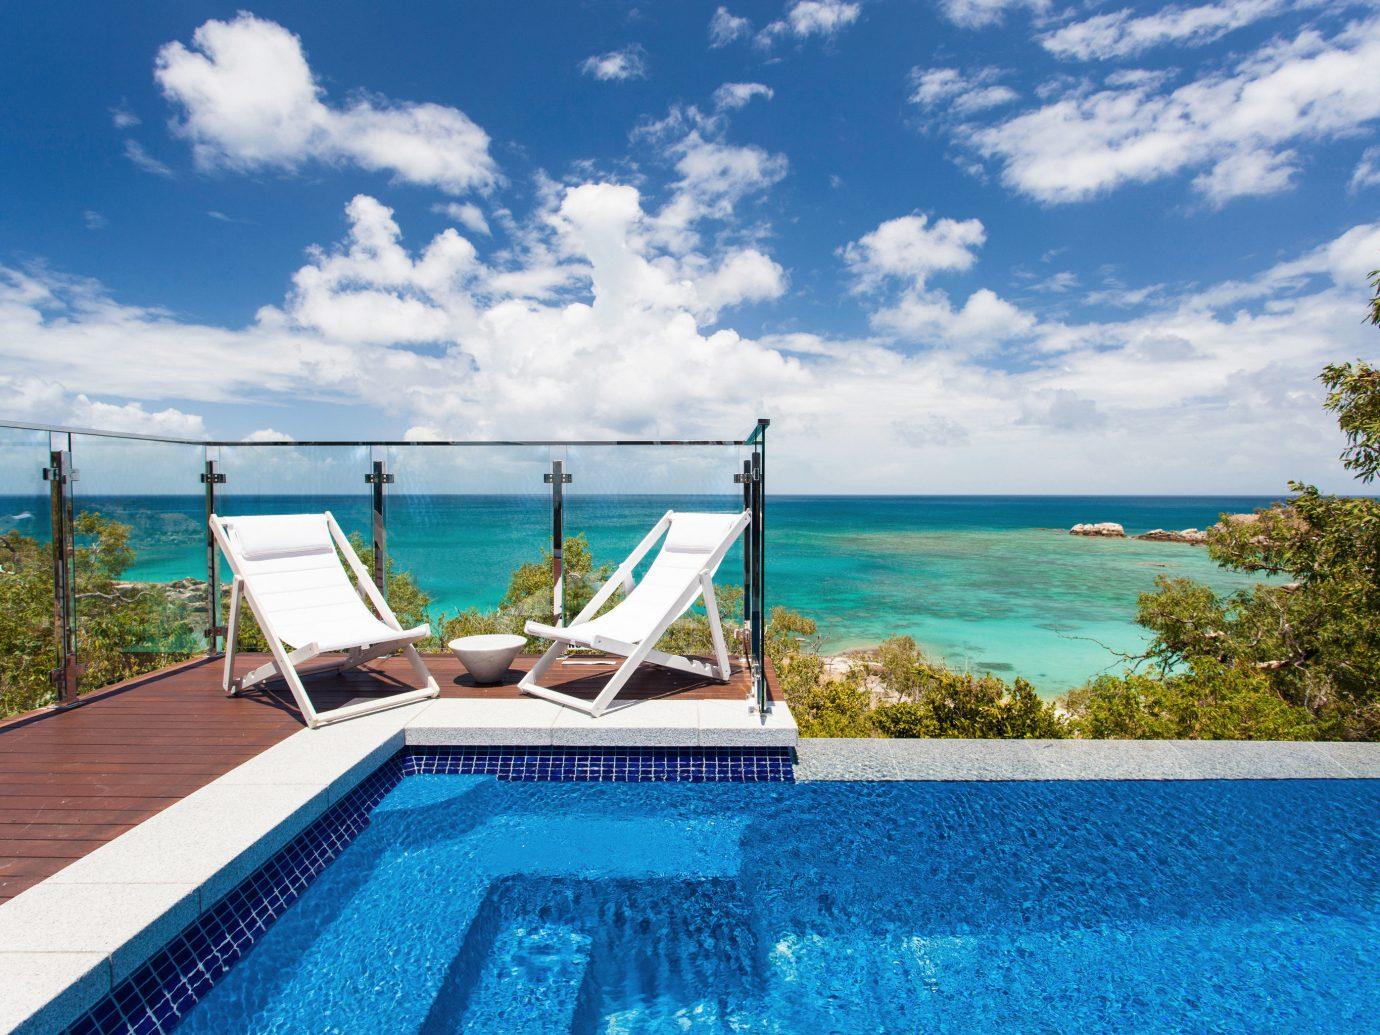 Trip Ideas sky water swimming pool property leisure caribbean Sea Ocean Resort Villa Lagoon blue day